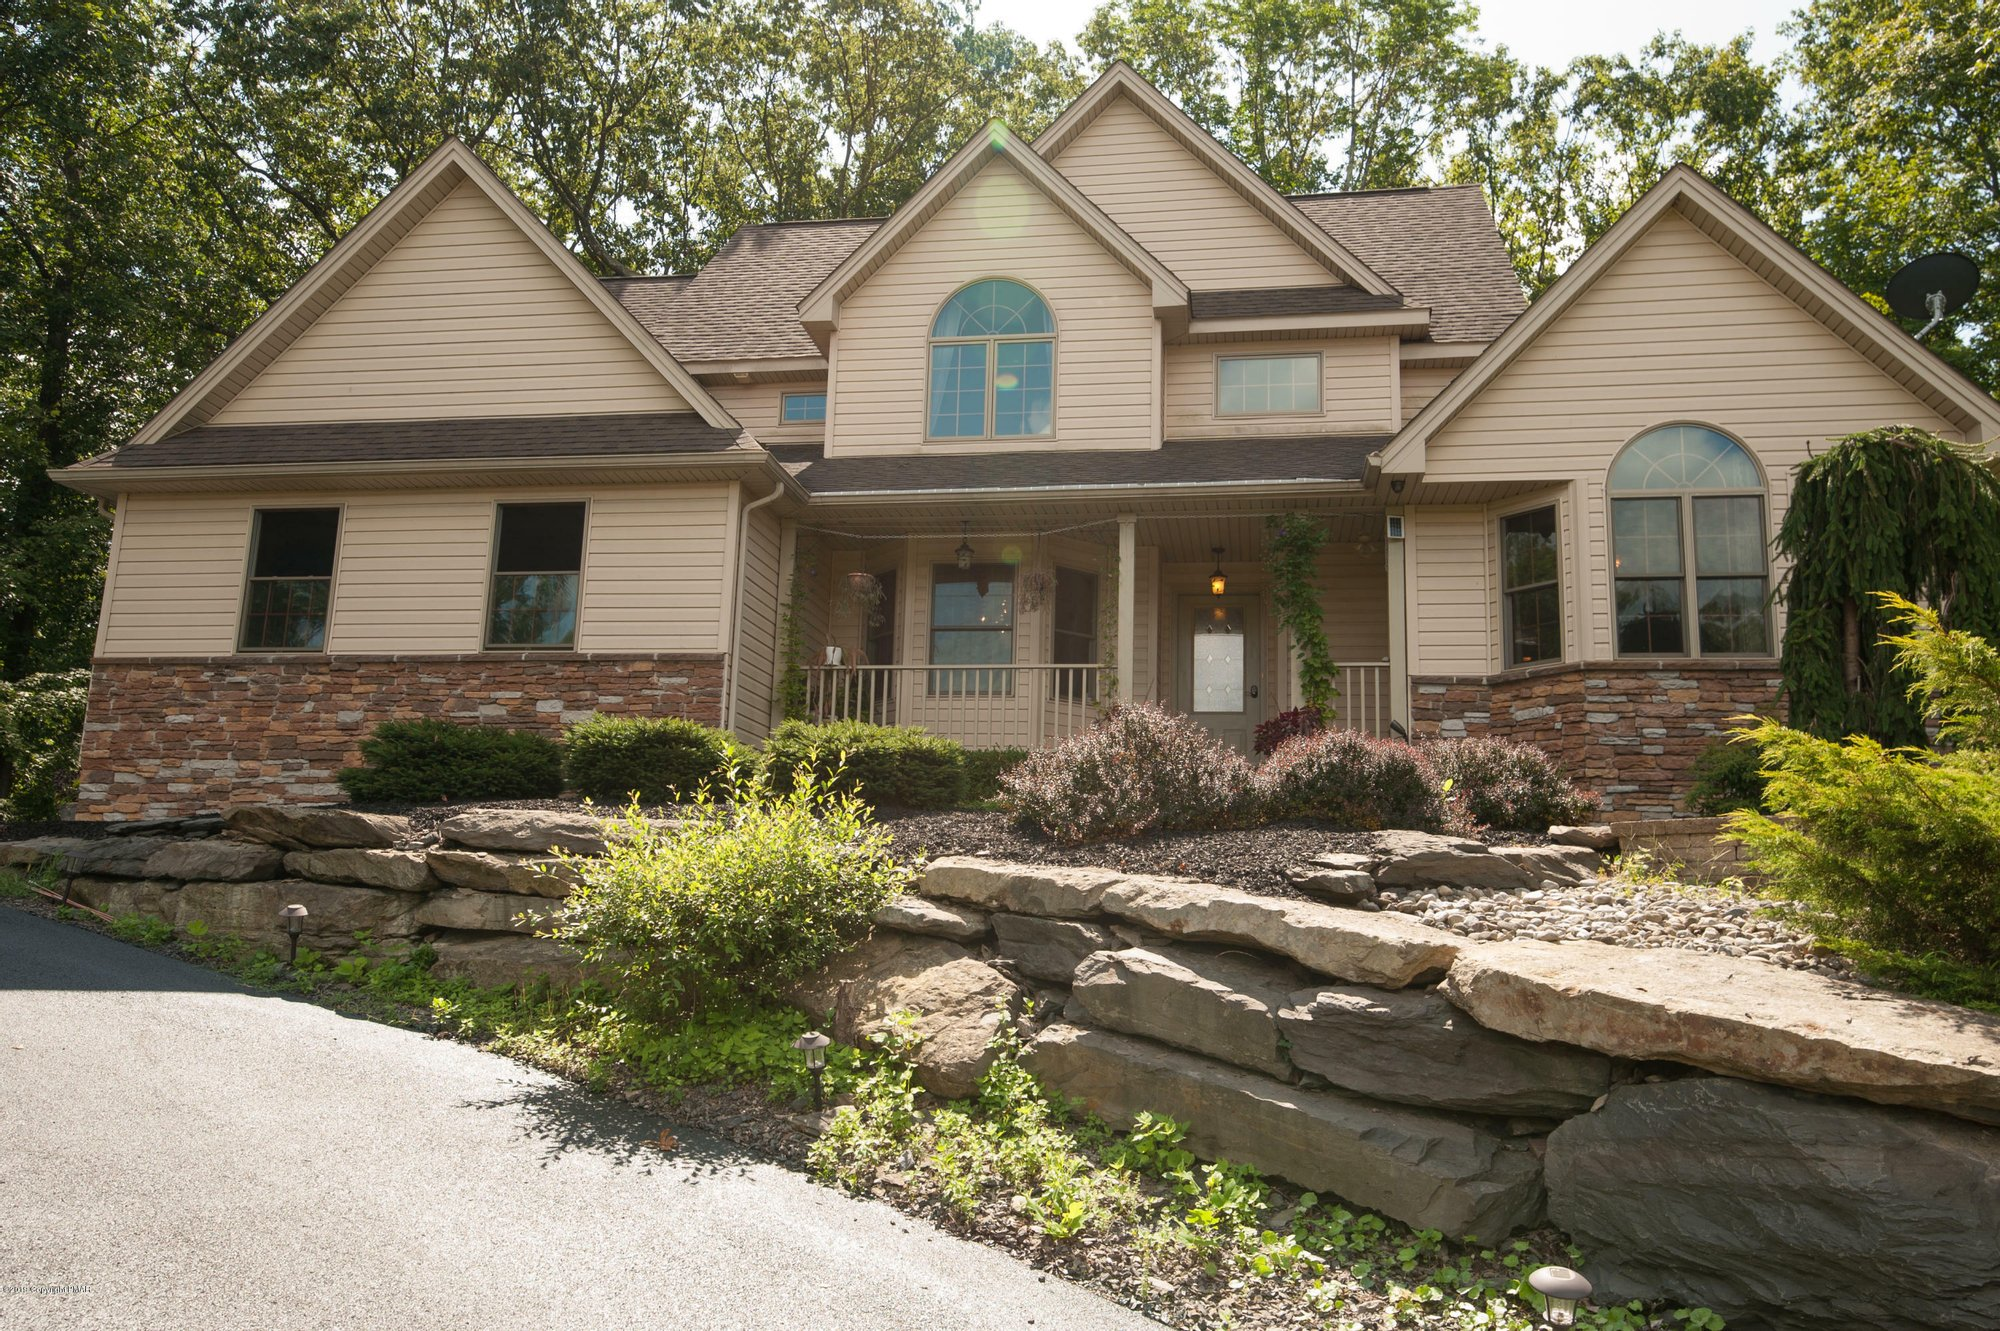 Casa a East Stroudsburg, Pennsylvania, Stati Uniti 1 - 11445605